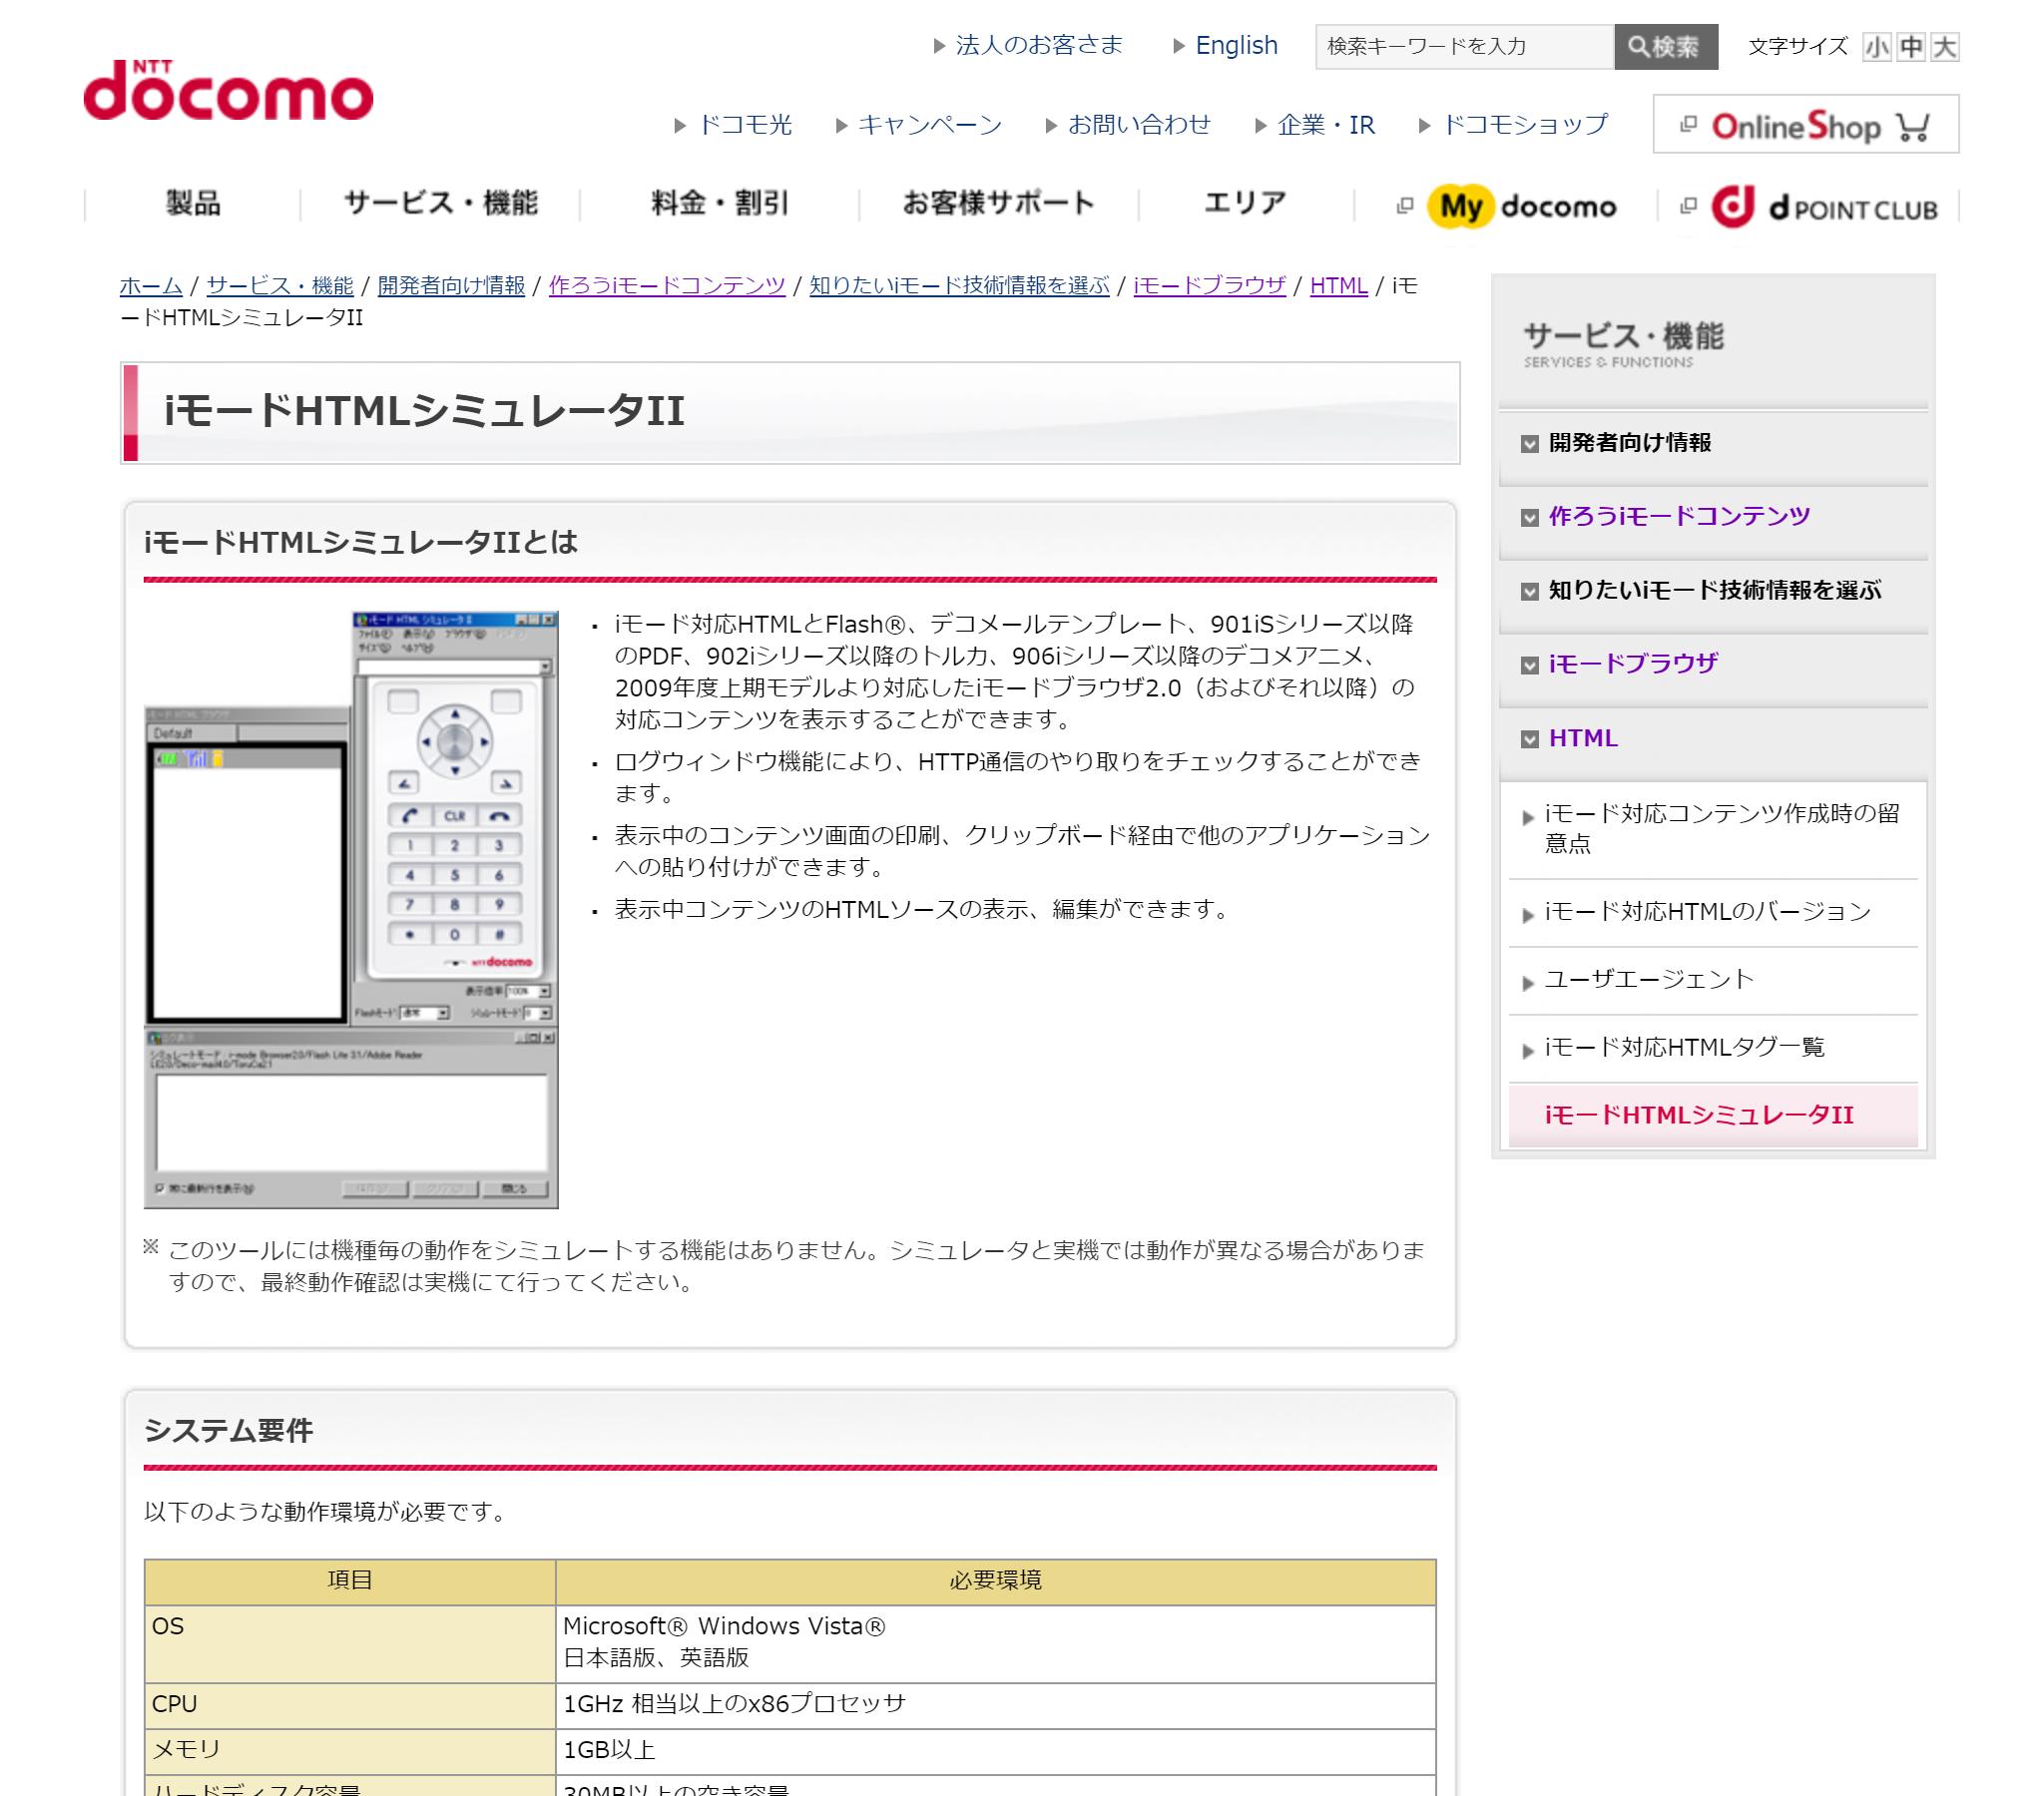 www.nttdocomo.co.jp_service_developer_make_content_browser_html_tool2